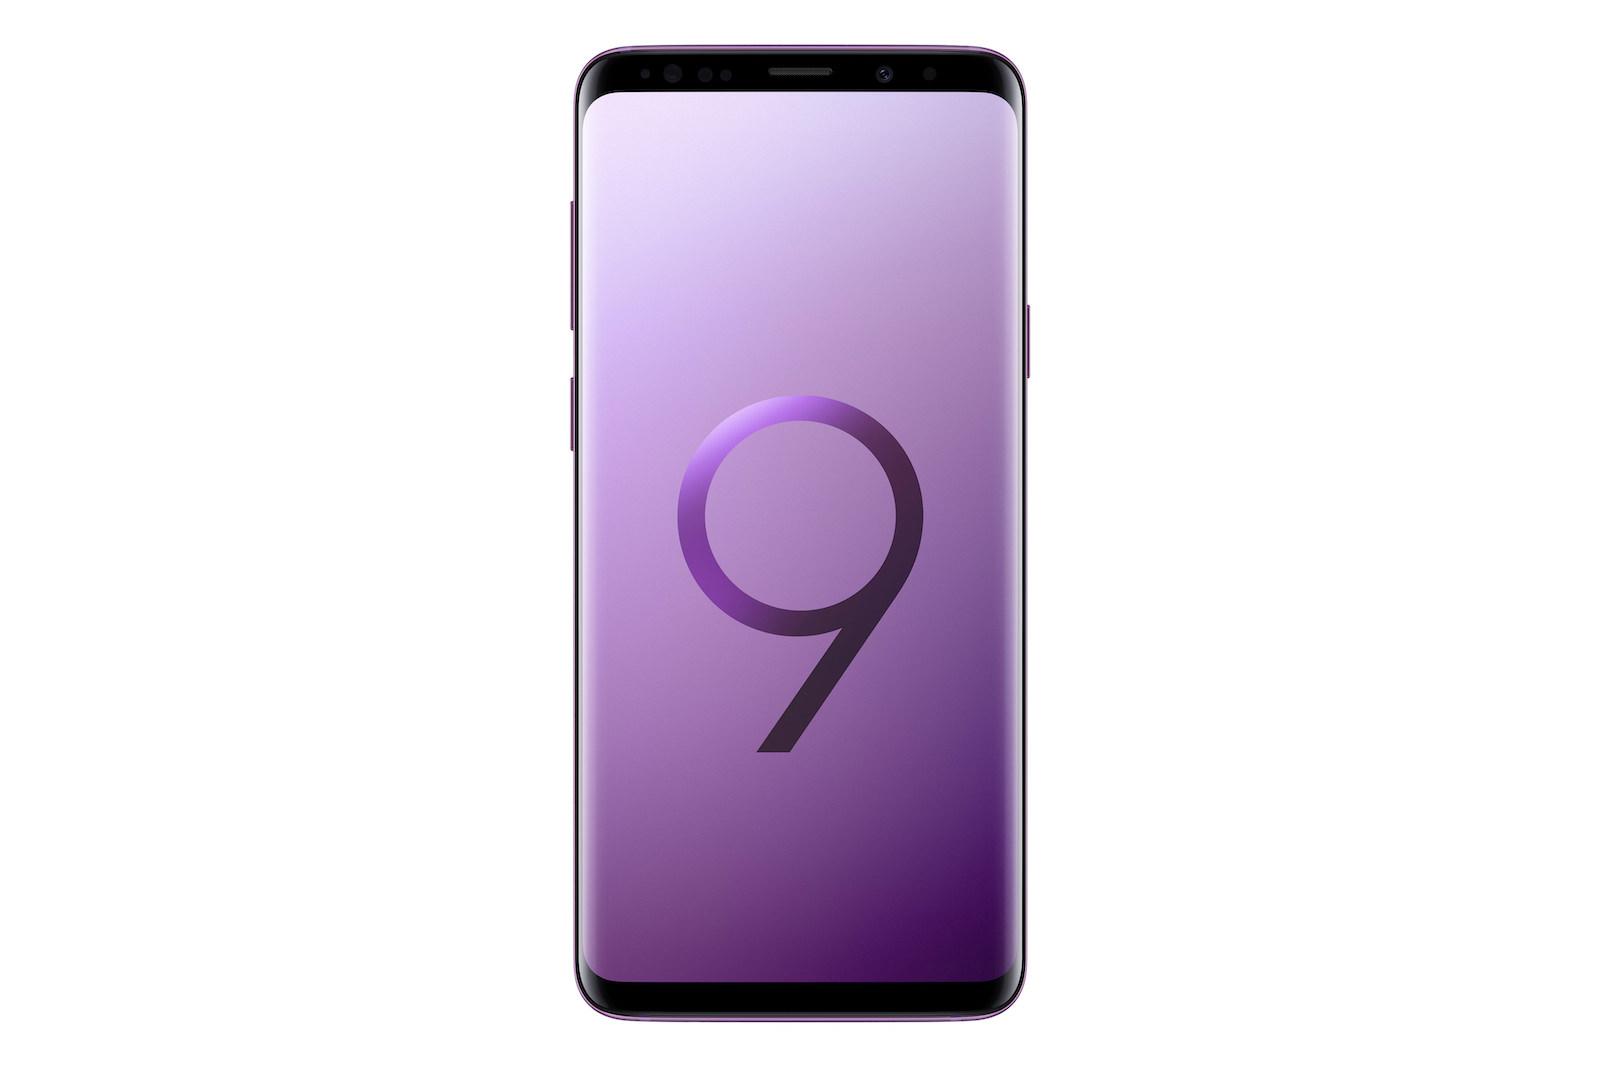 GalaxyS9Plus_Front_Purple